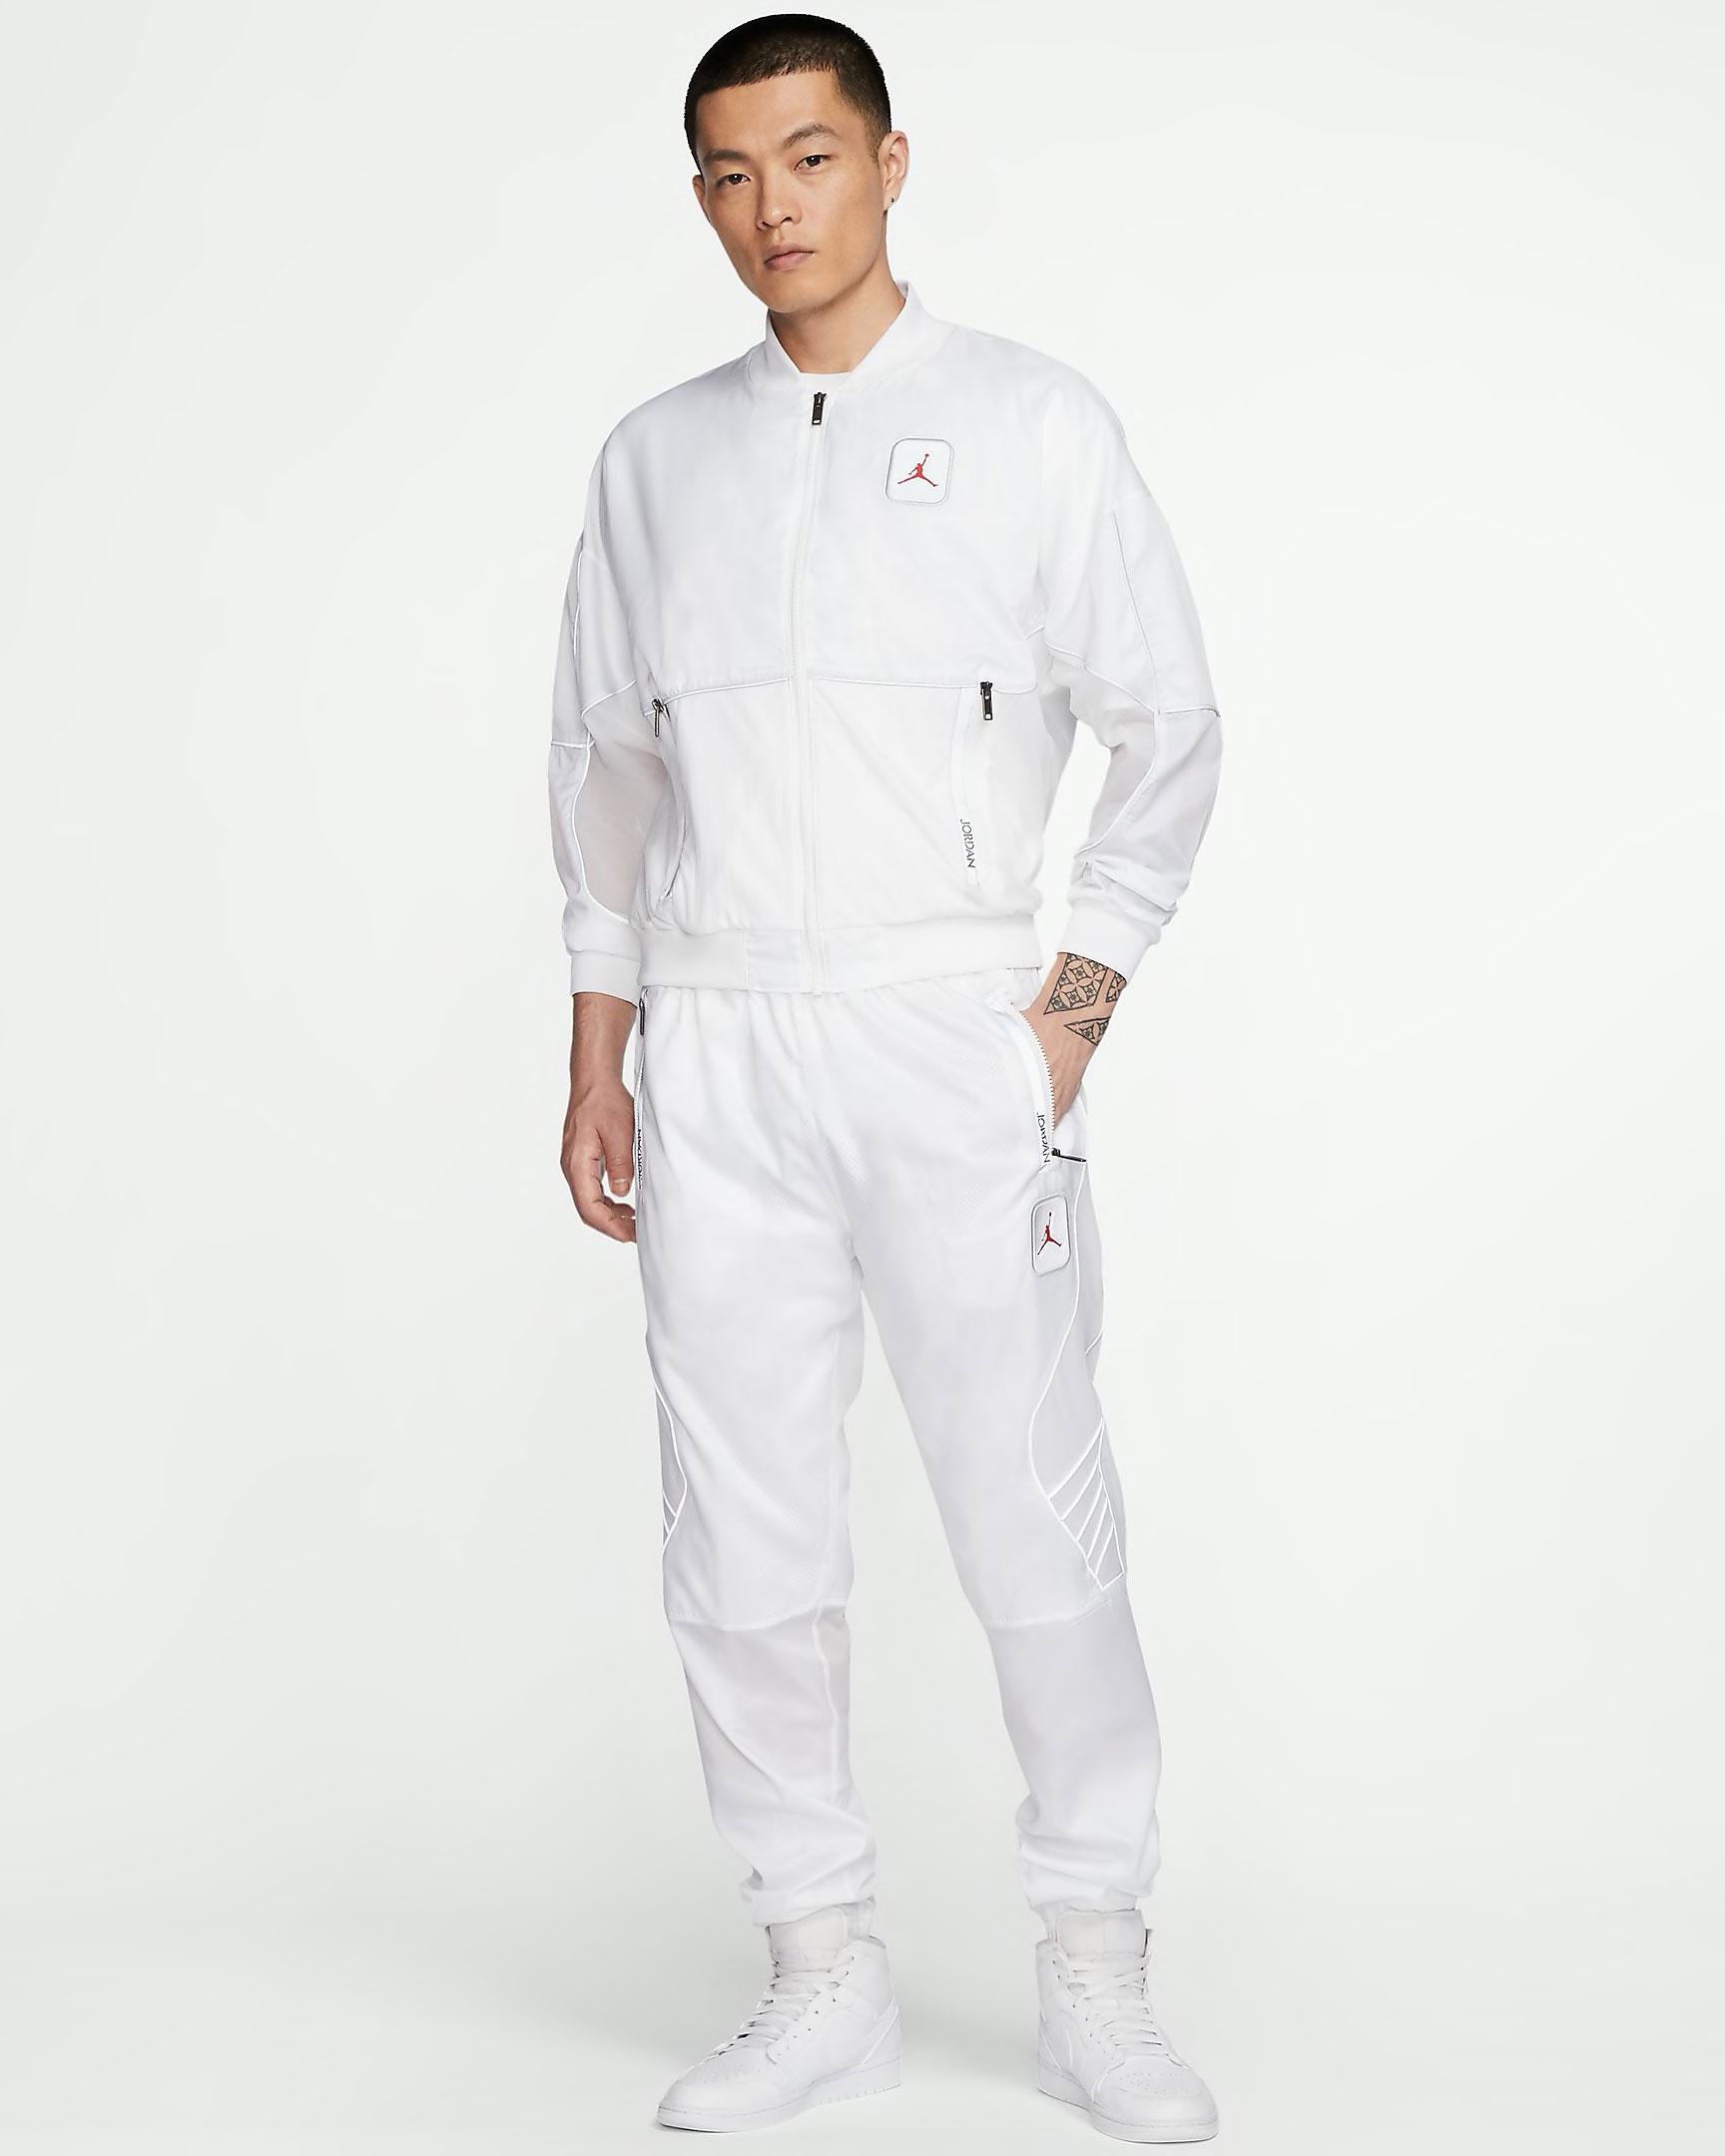 air-jordan-5-fire-red-2020-jacket-pants-outfit